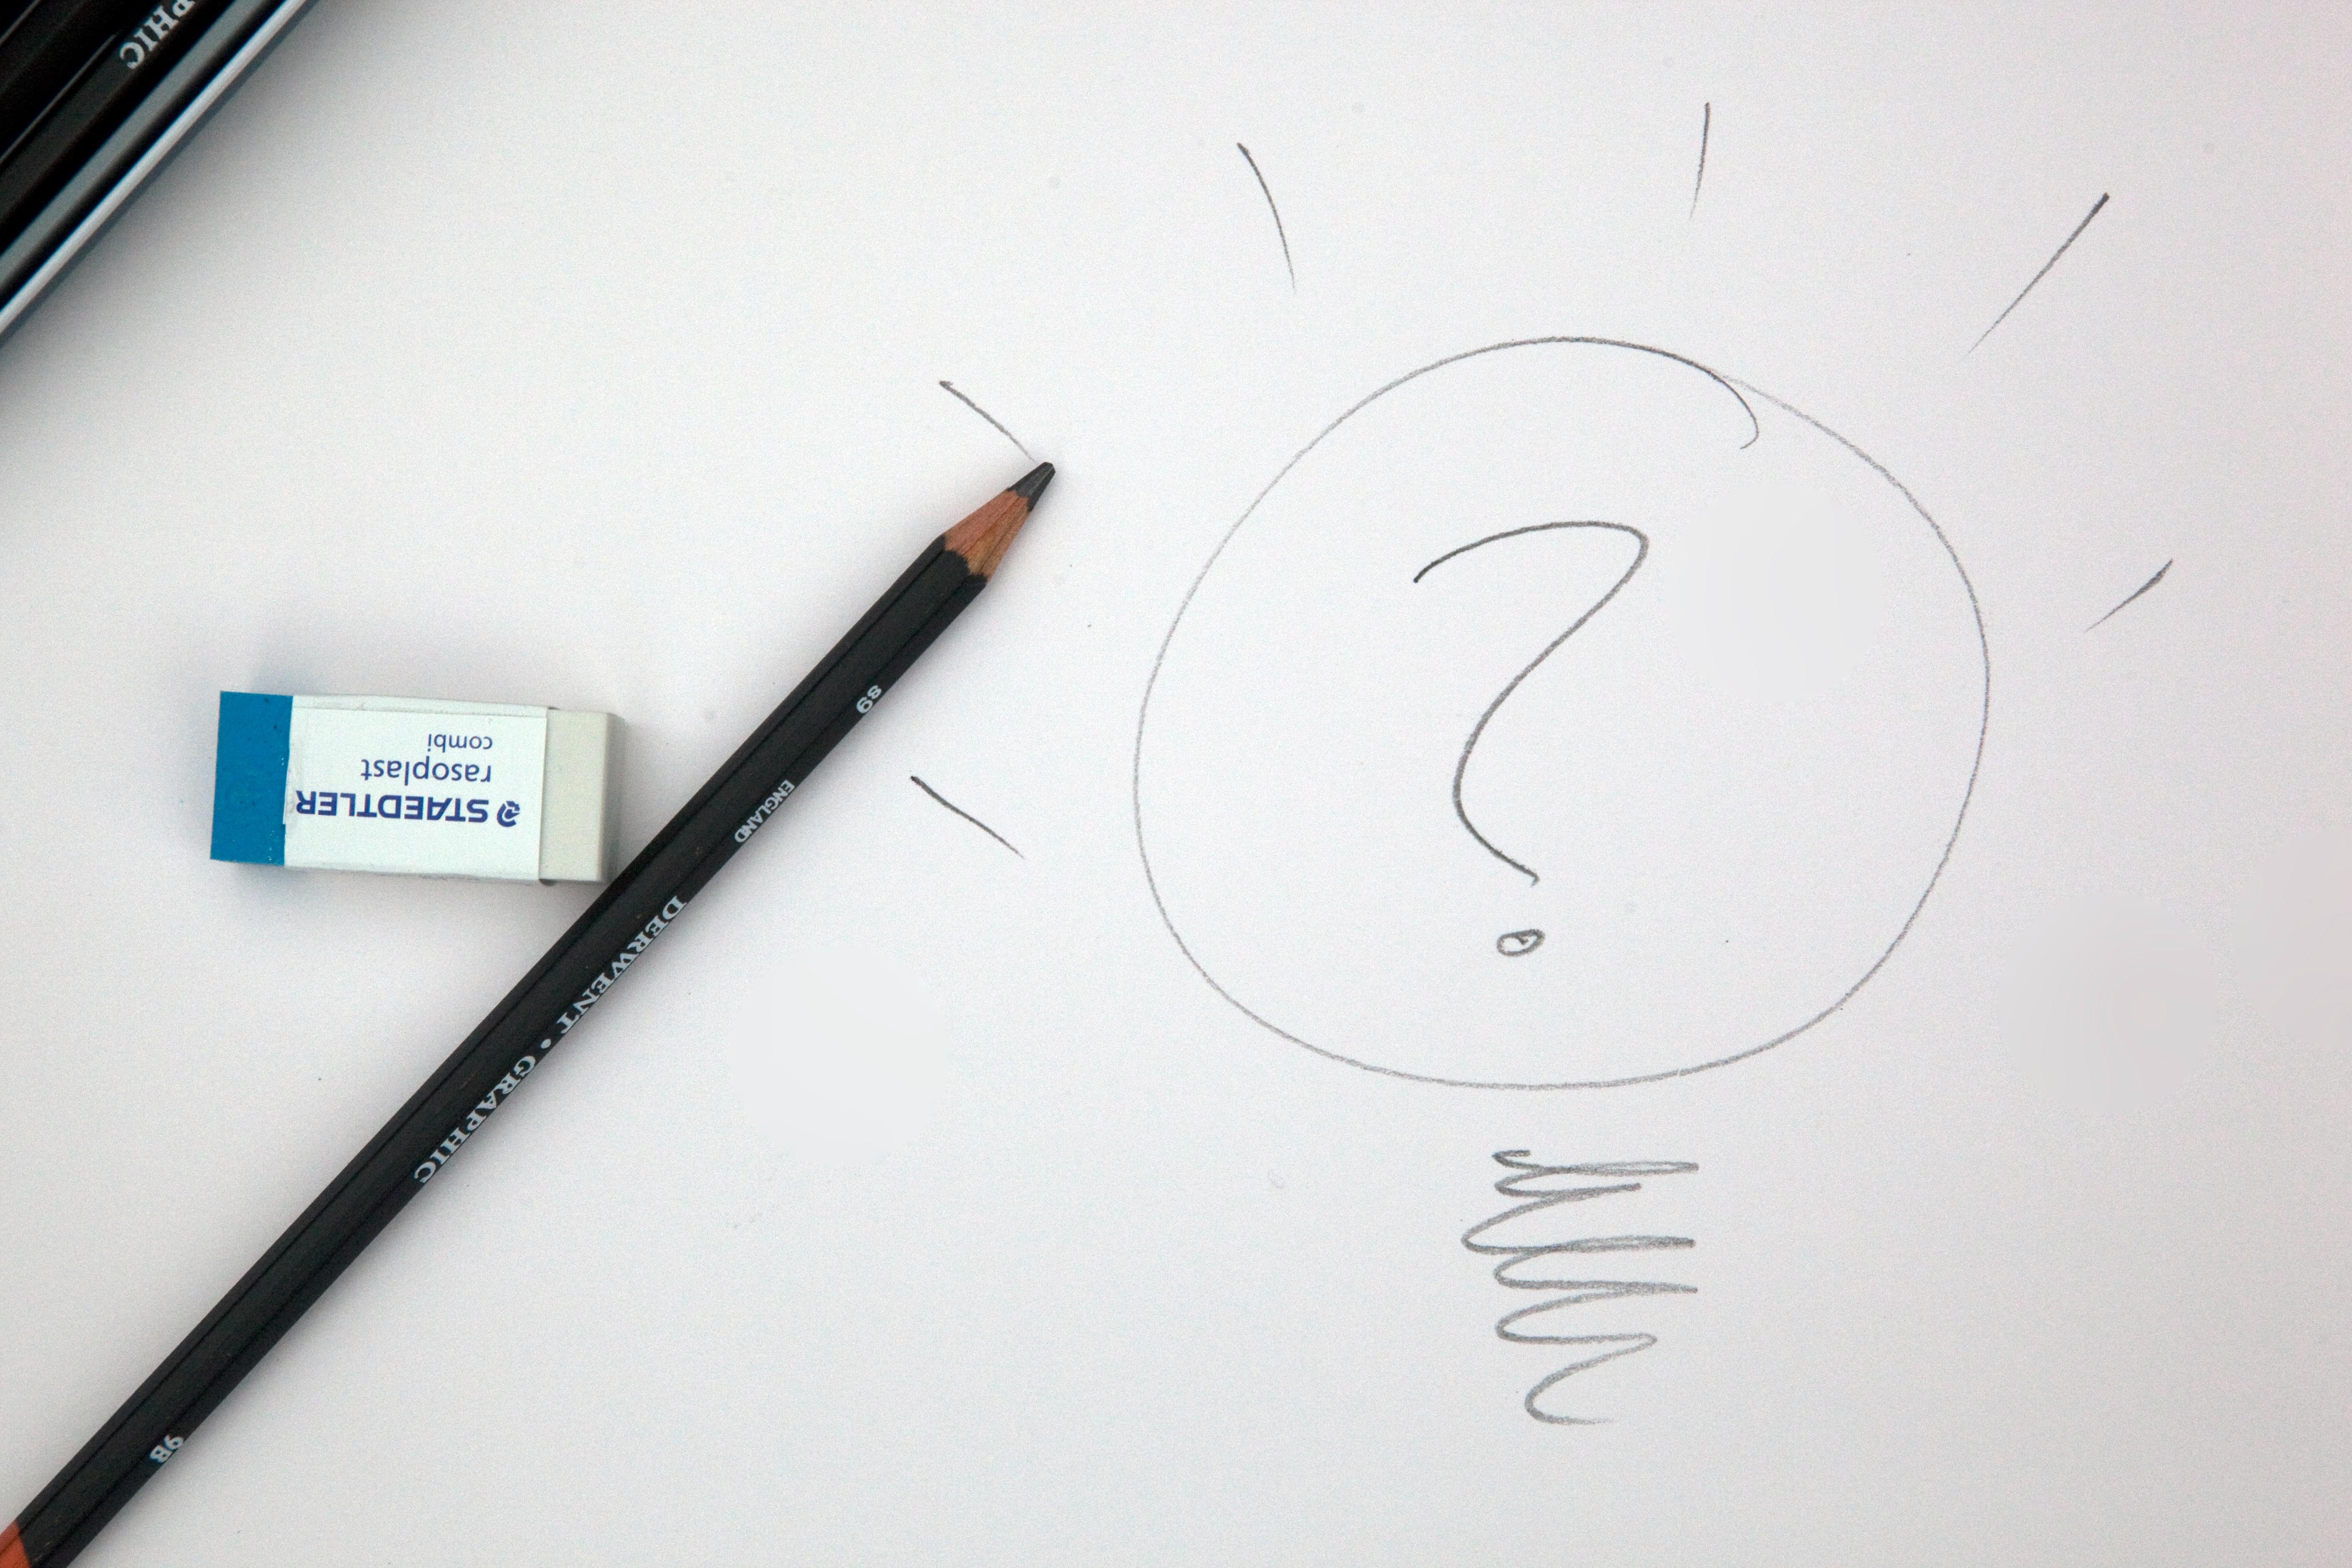 paper-questionmark-pencil